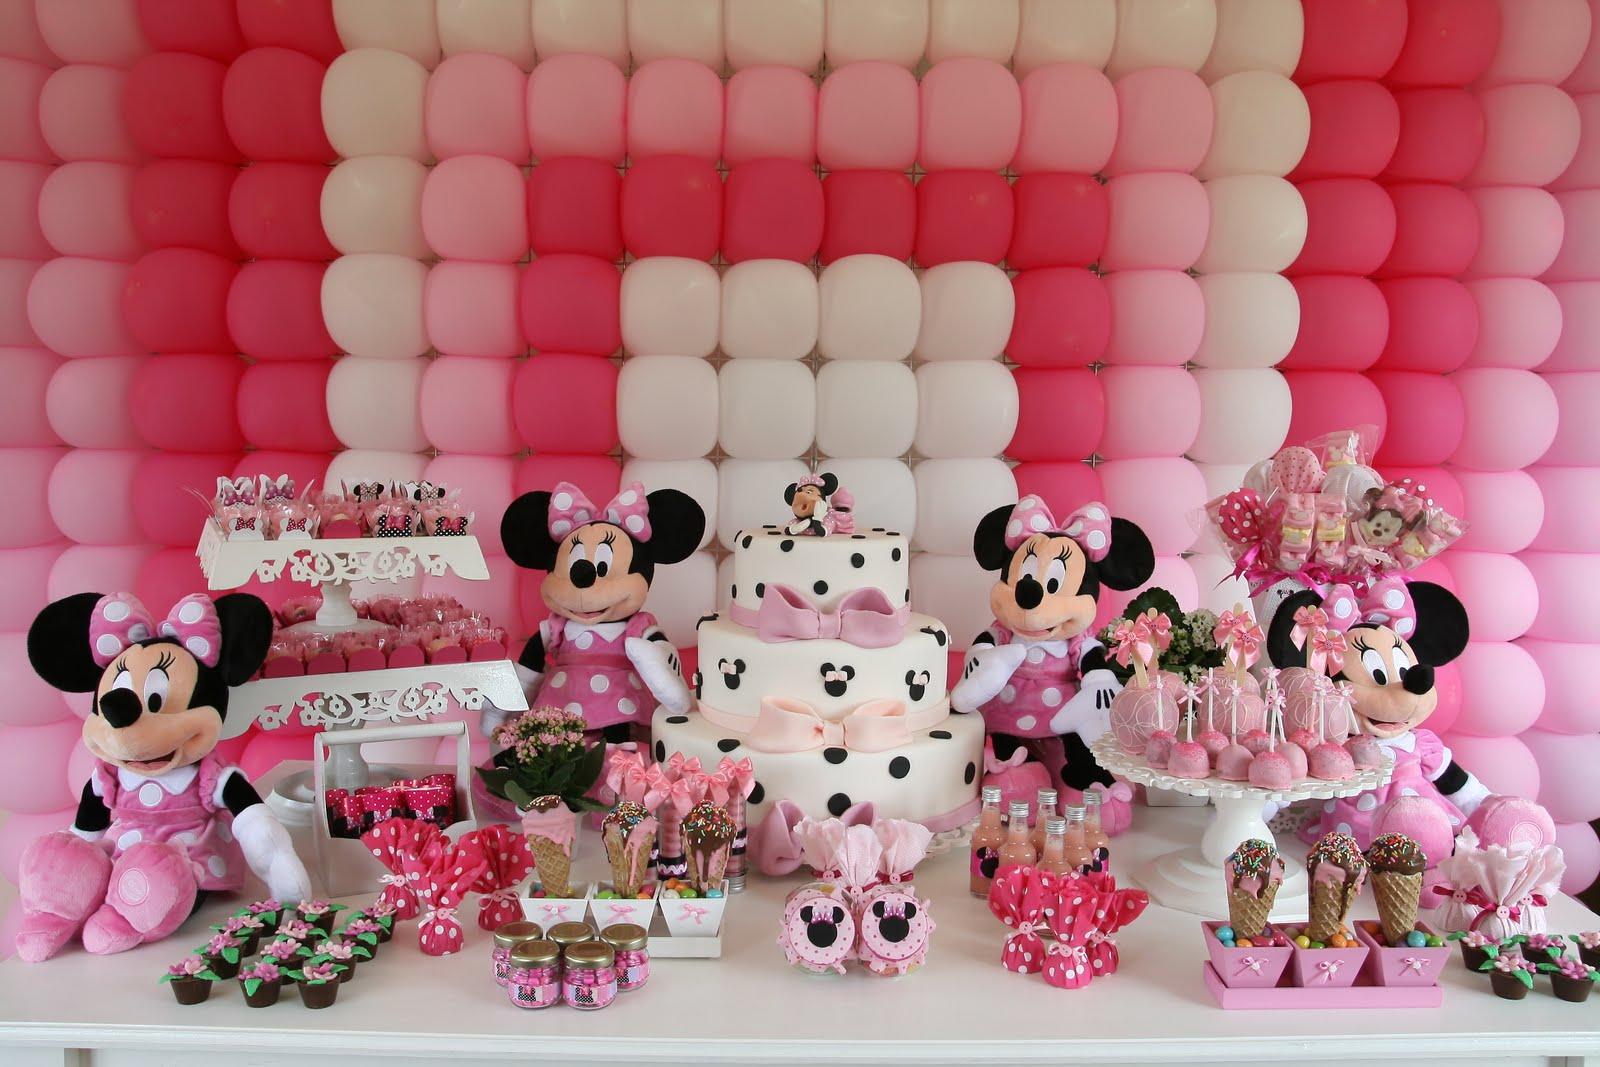 Temas de festa infantil for Decoracion fiesta infantil nina